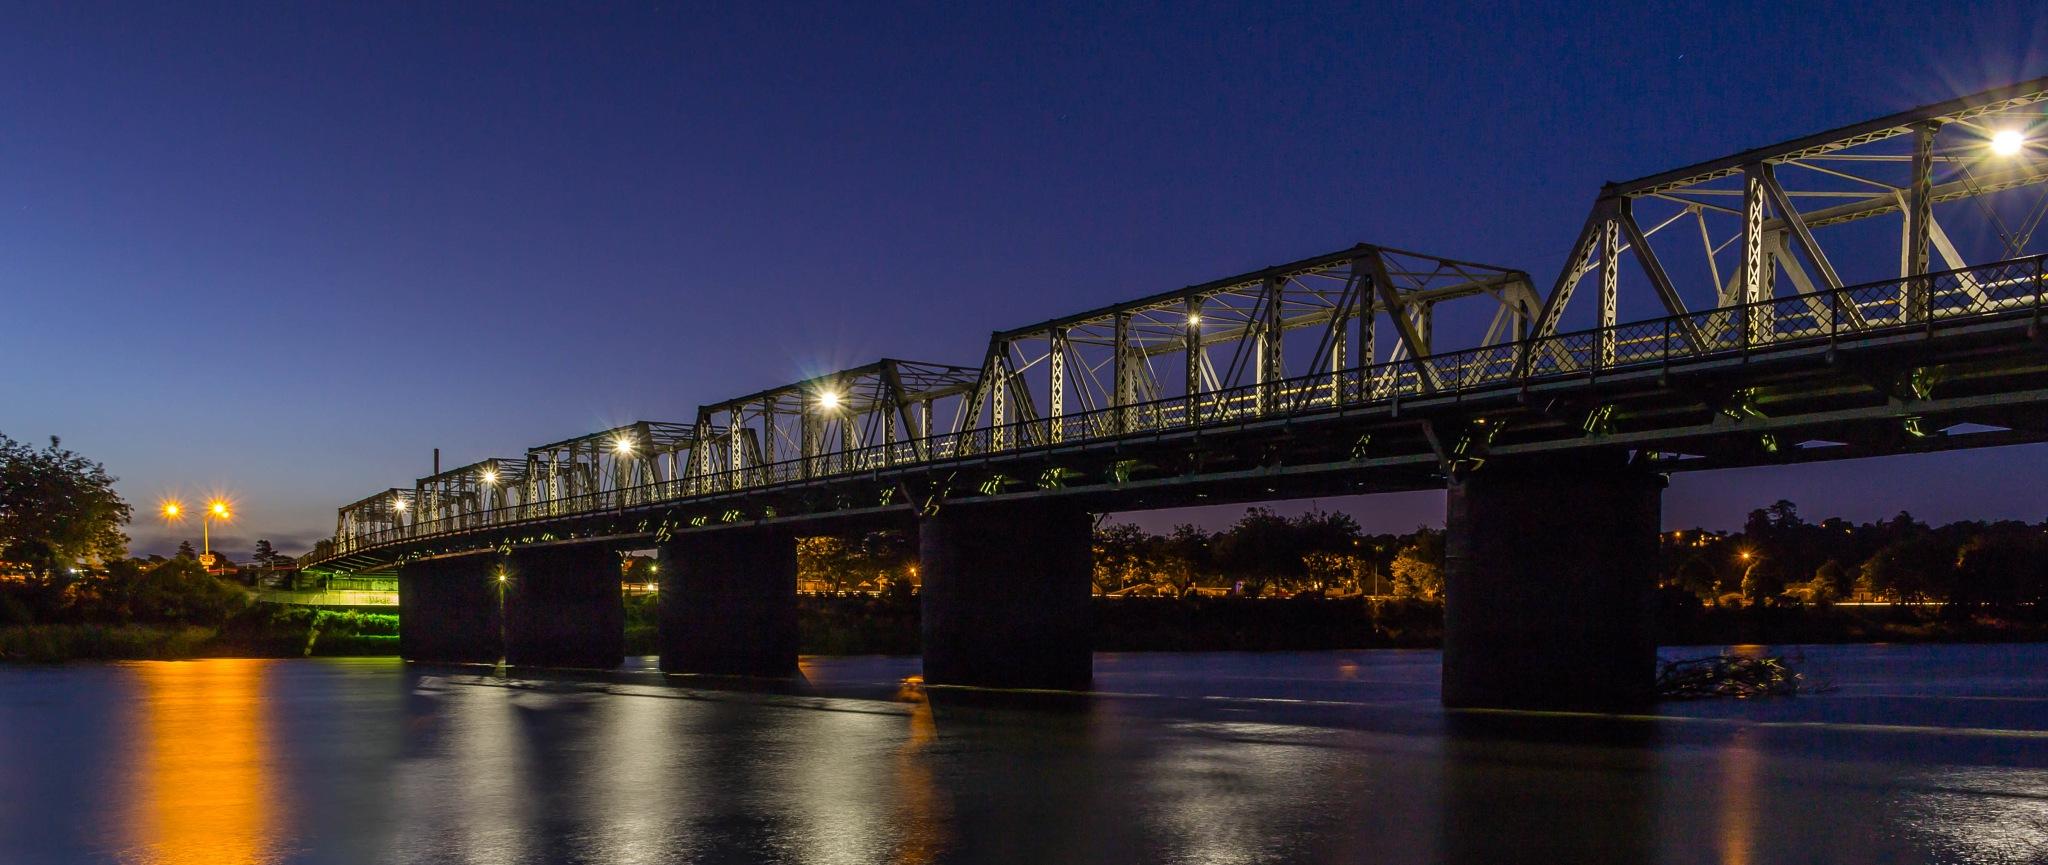 Dublin Street Bridge, Wanganui by AnnekaBarrittphotographyNZ